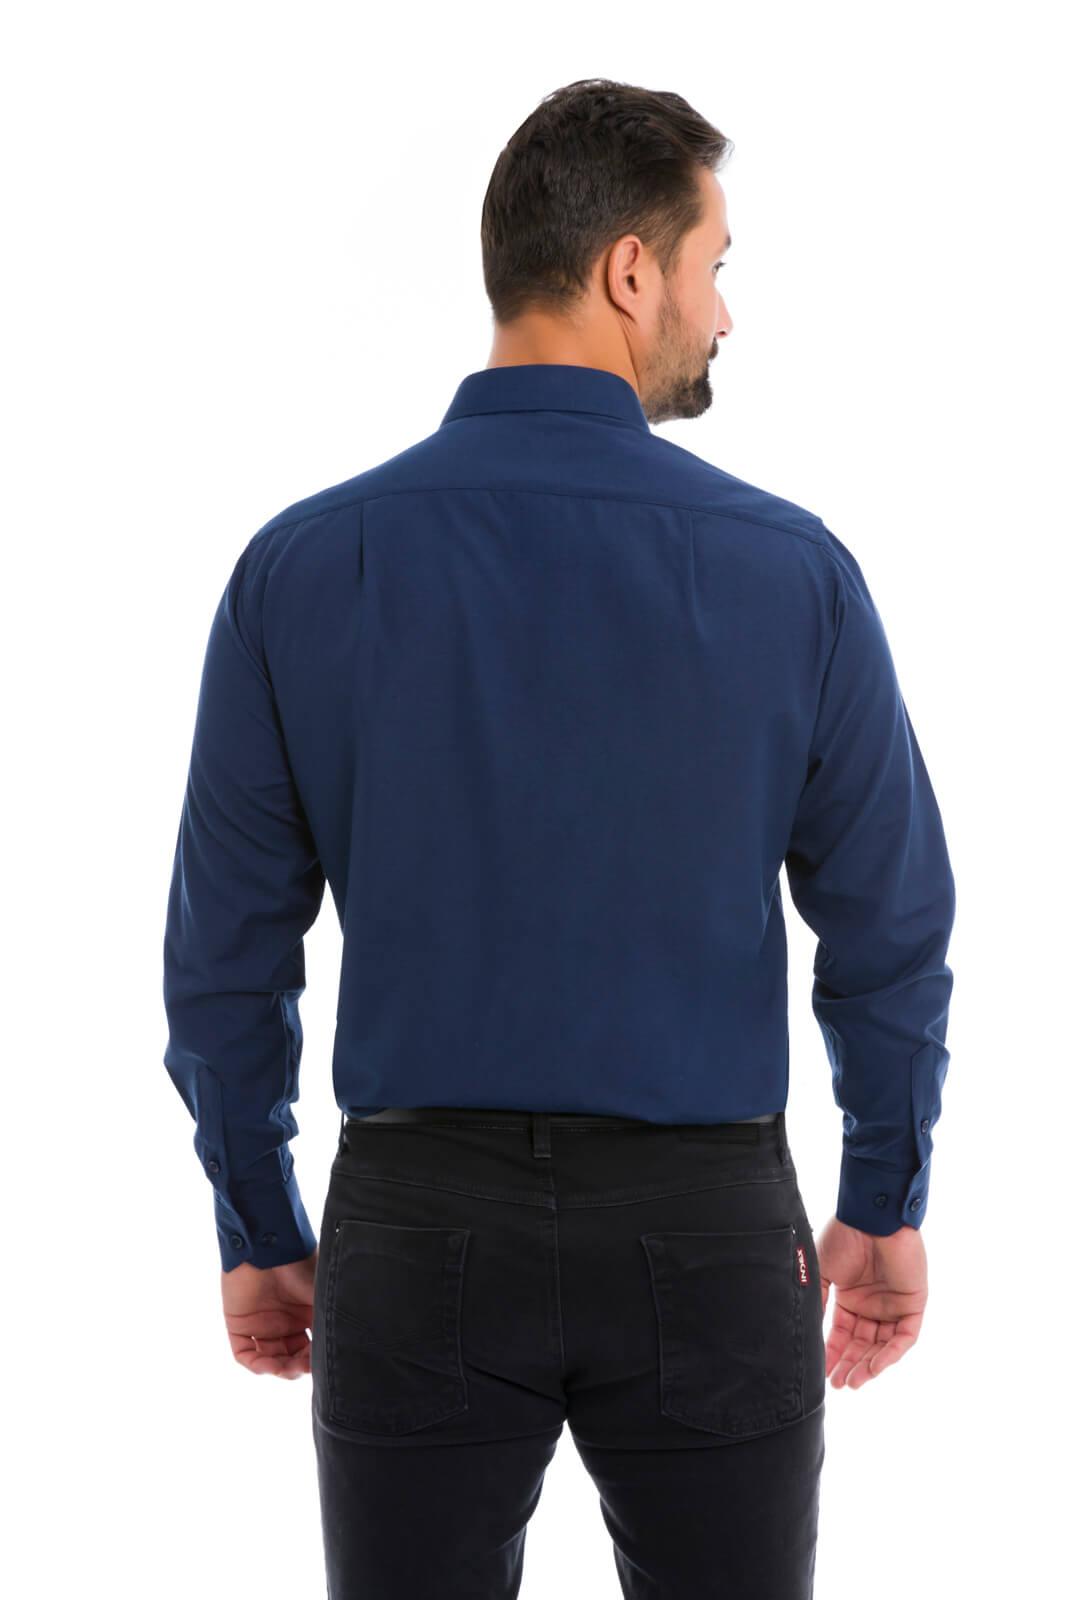 Camisa Social Masculina Olimpo Lisa com Bolso Manga Longa